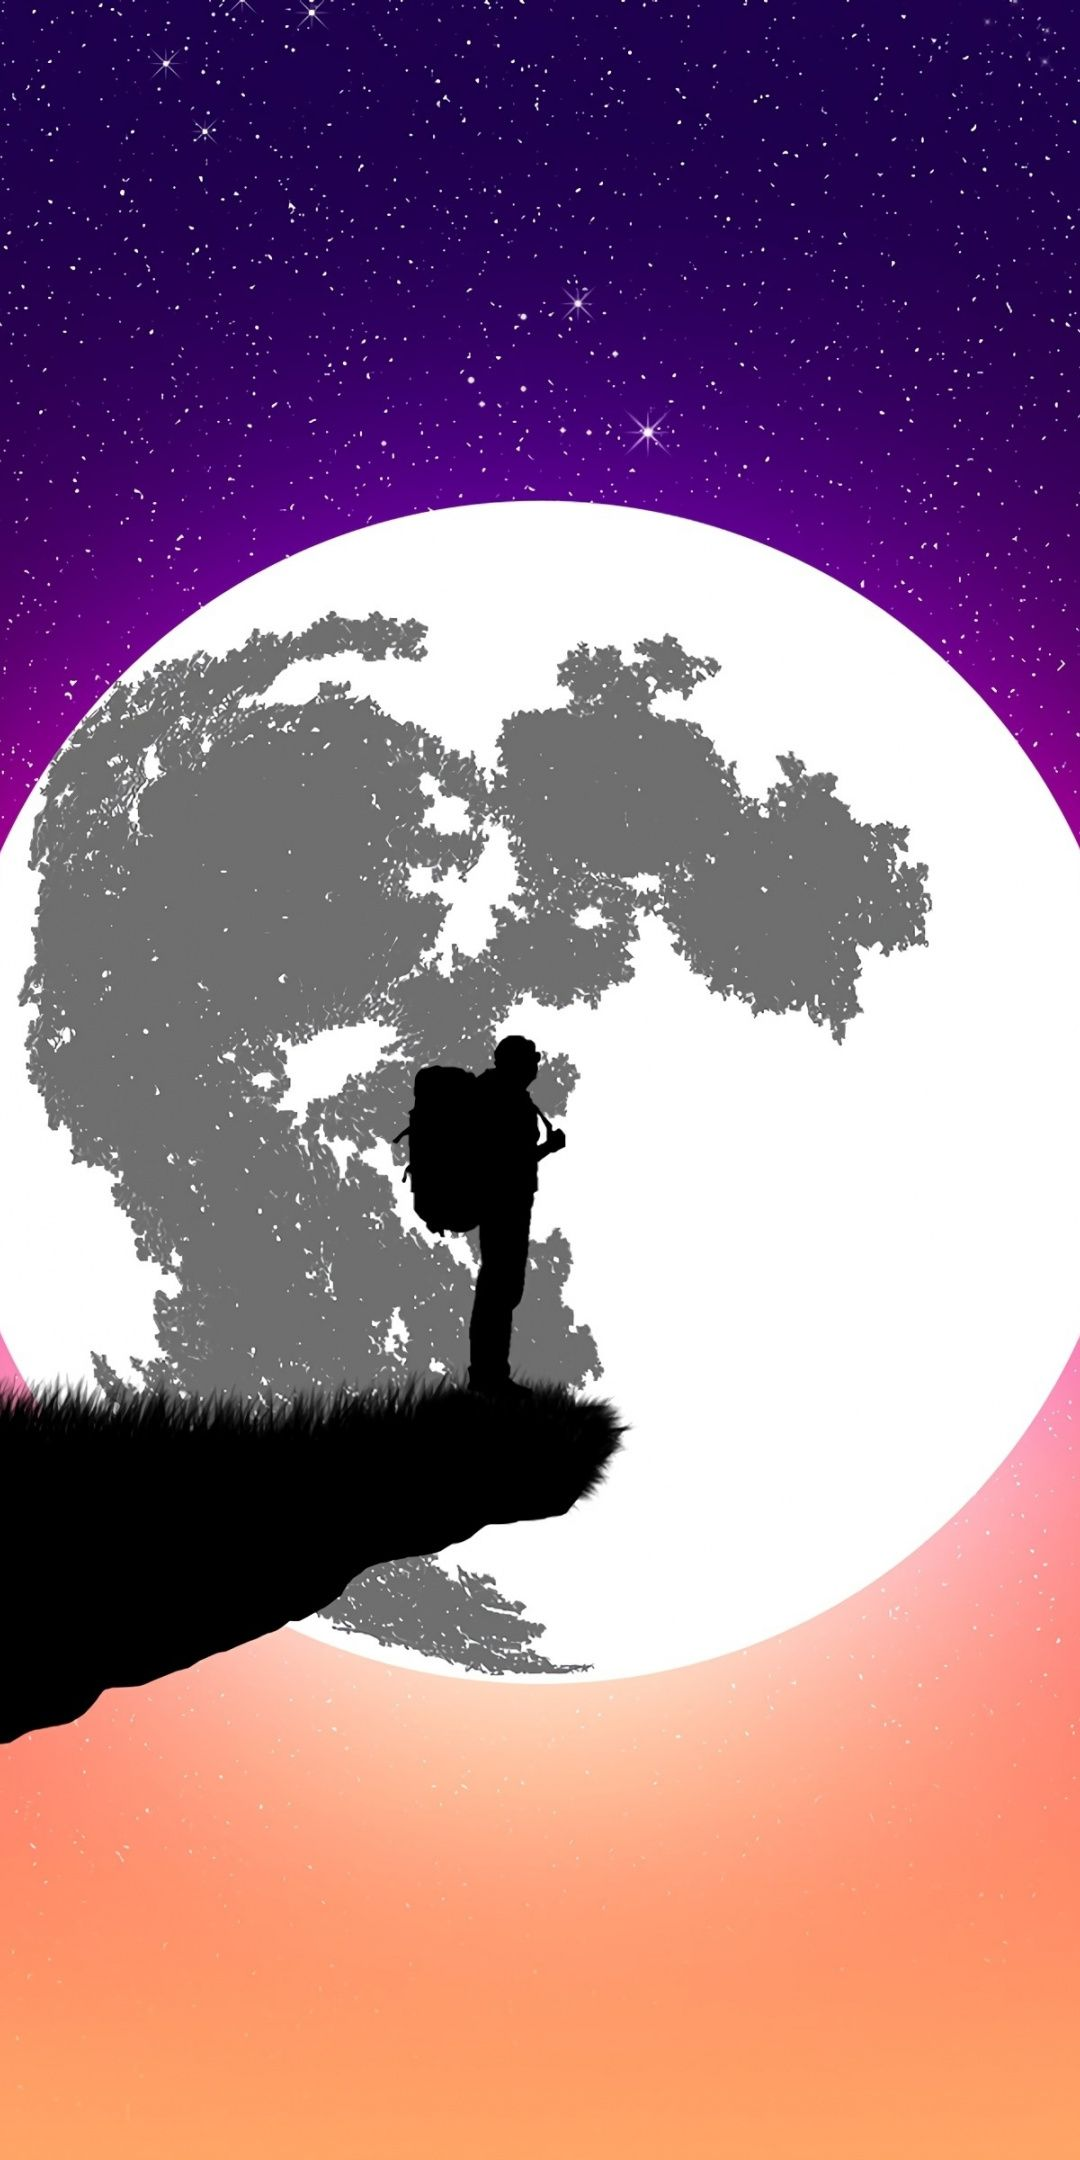 Silhouette Moon Man Digital Art Wallpaper Desenhos De Anime